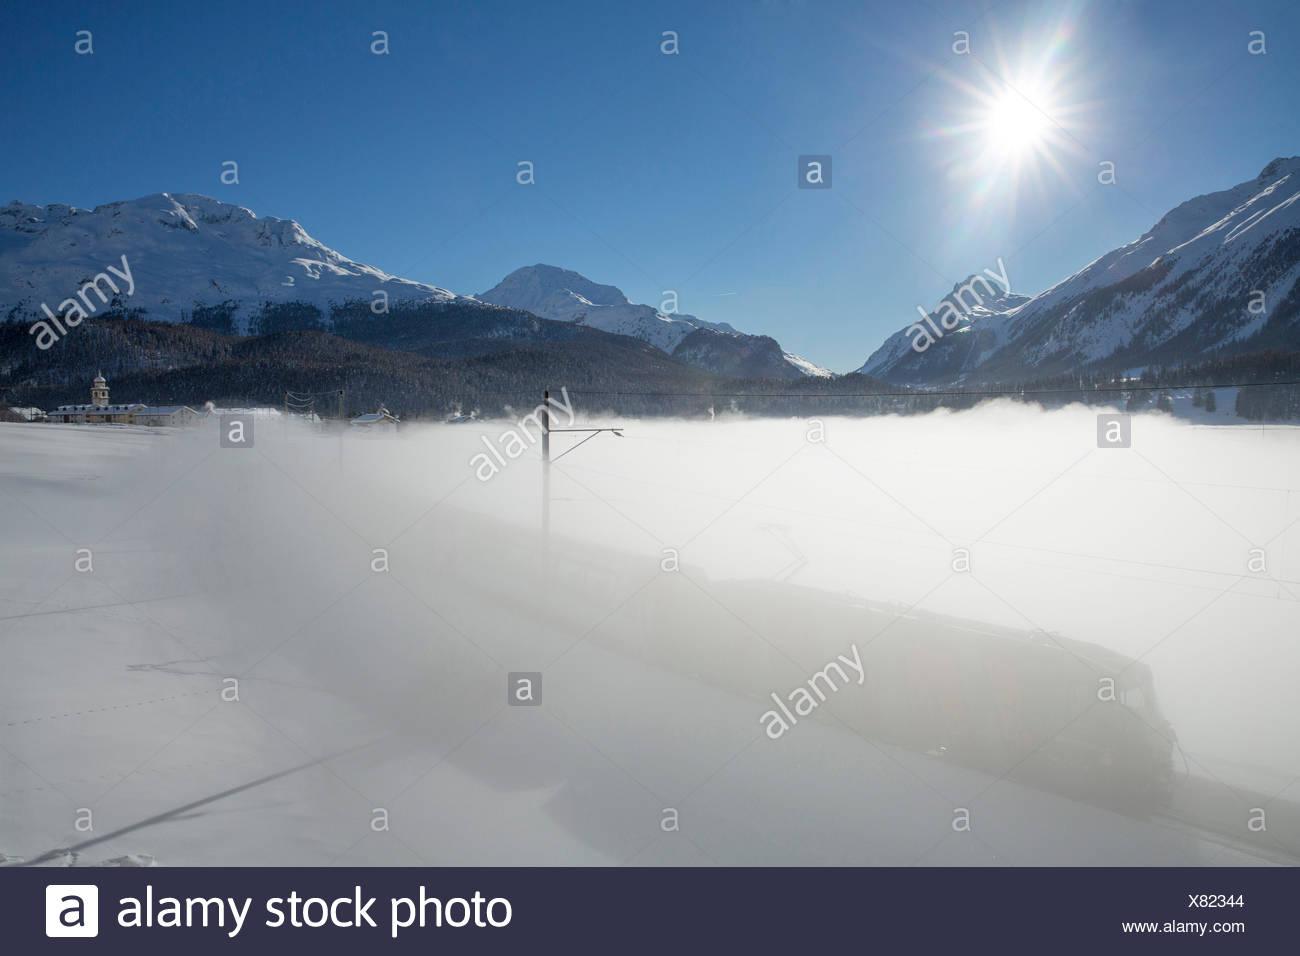 Engadin, Engadine, RHB Glacier express, Celerina, Inn, winter, canton, GR, Graubünden, Grisons, Upper Engadine, railway, train, - Stock Image